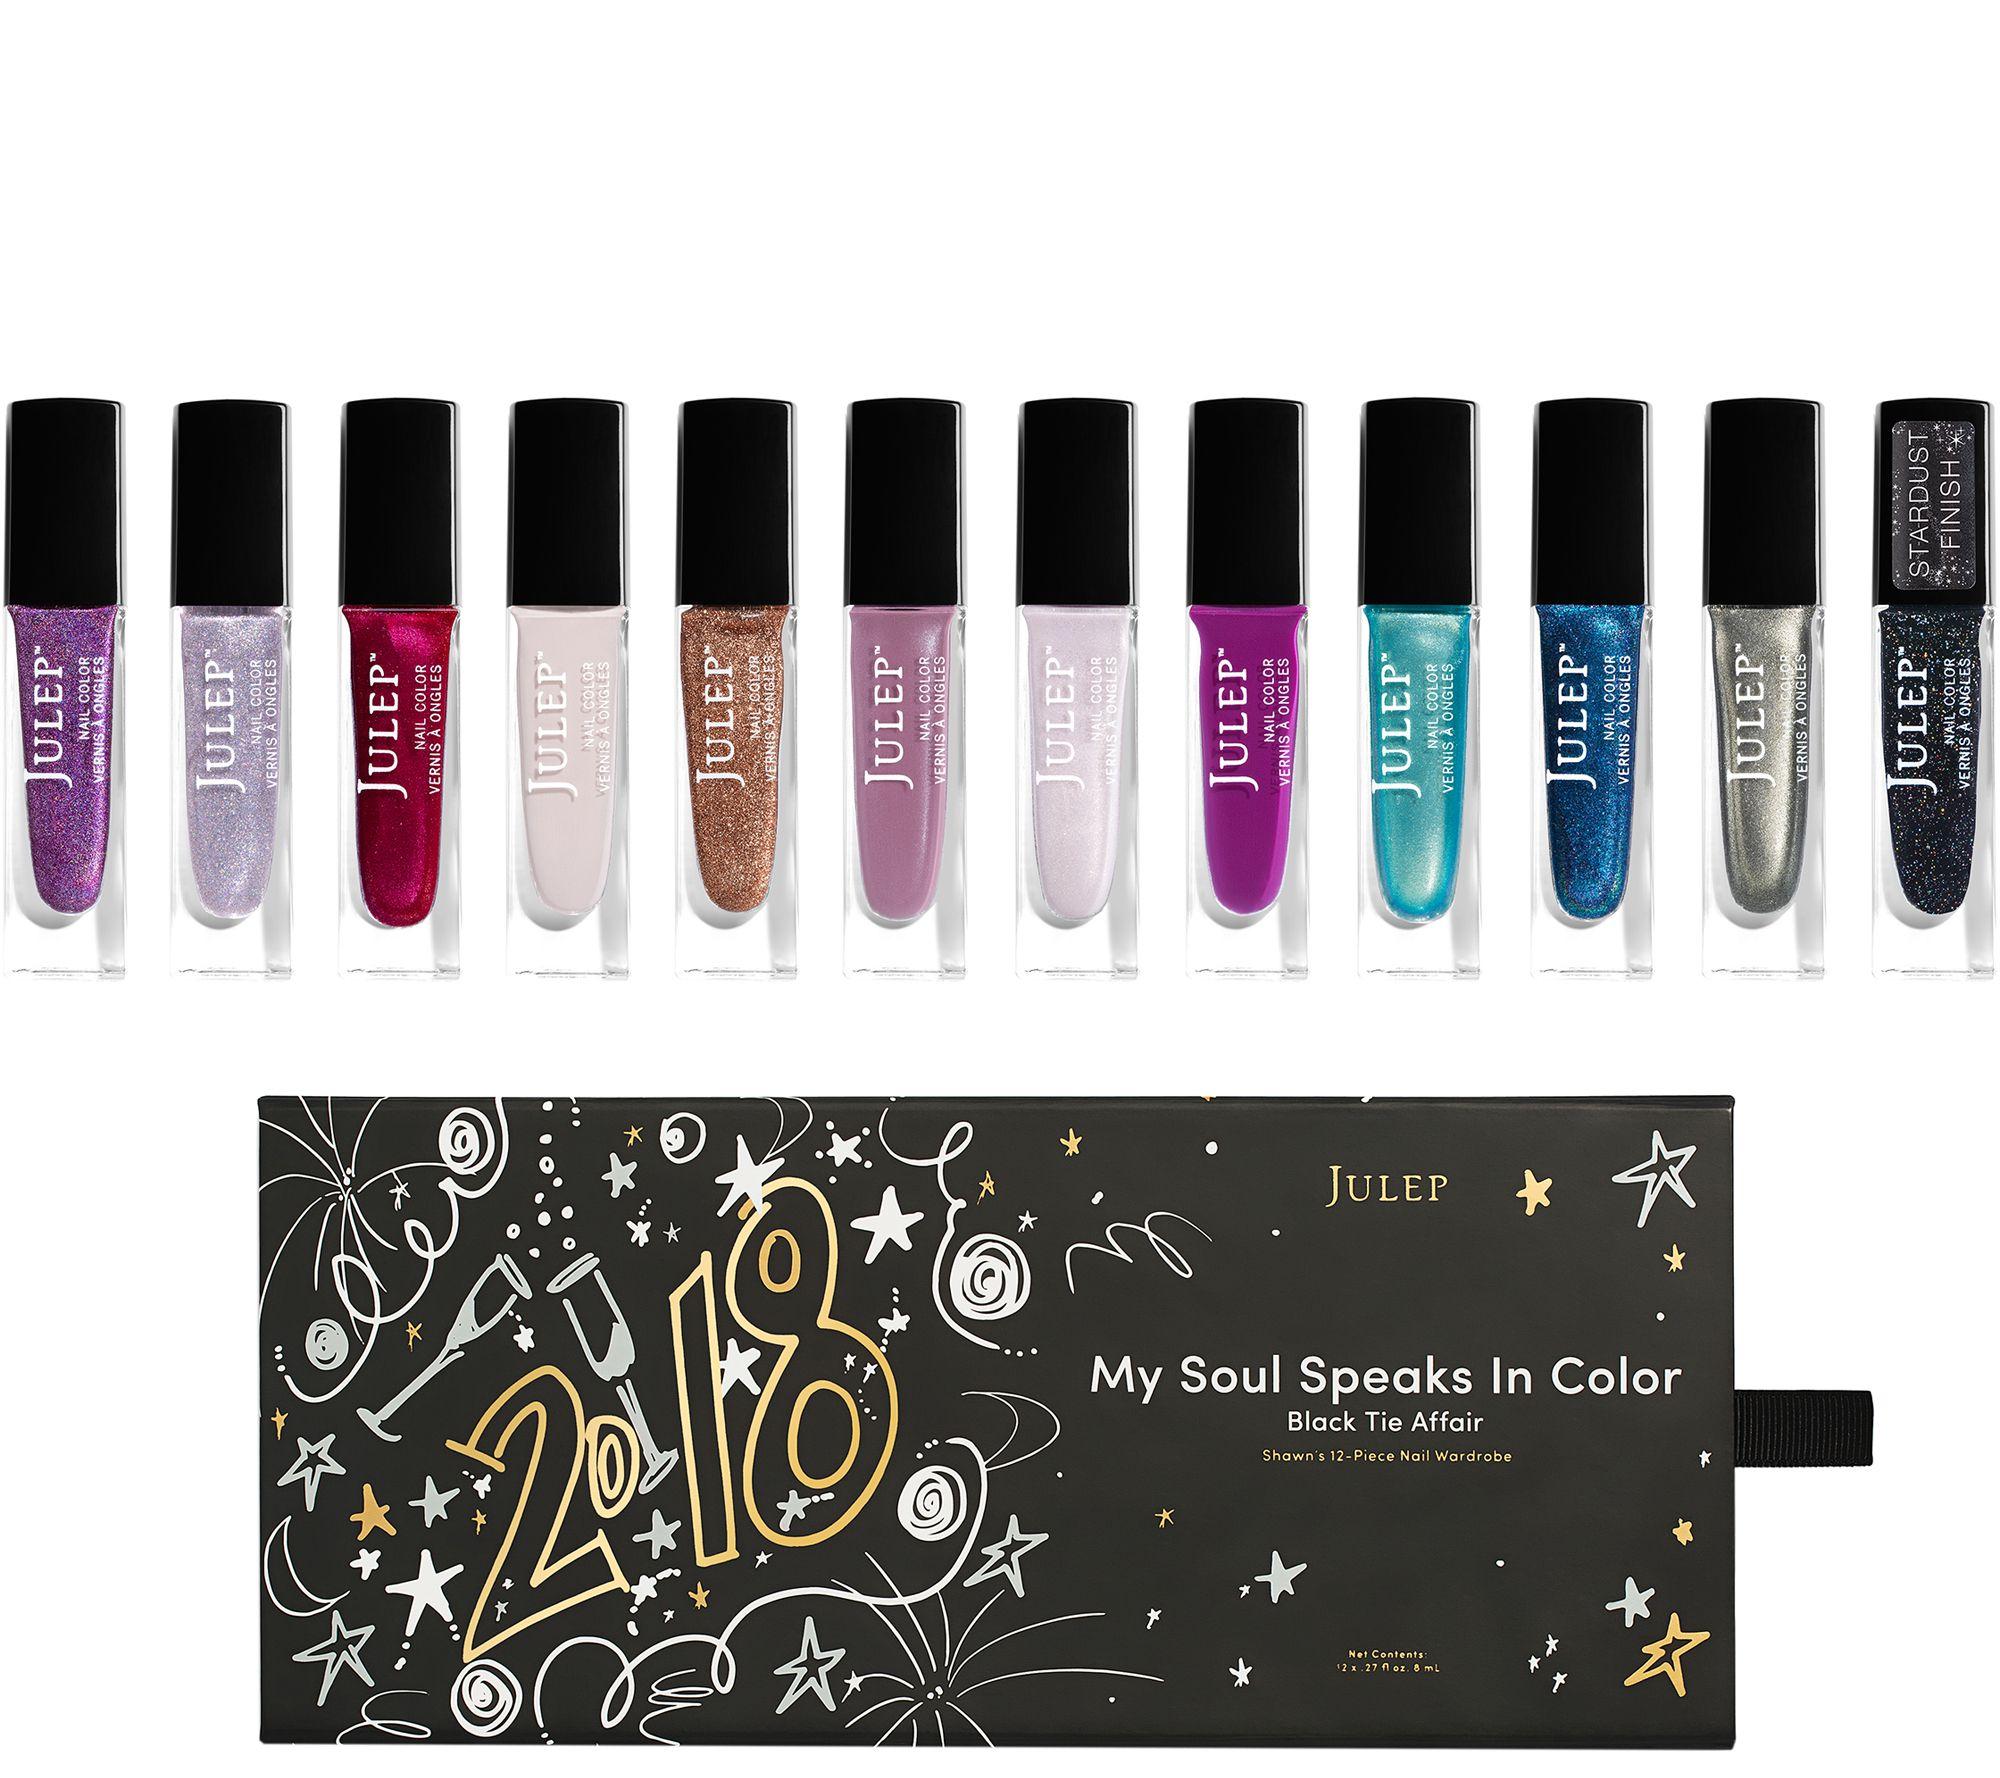 Julep — Nail Polish, Nail Care, Skin Care, Makeup — QVC.com